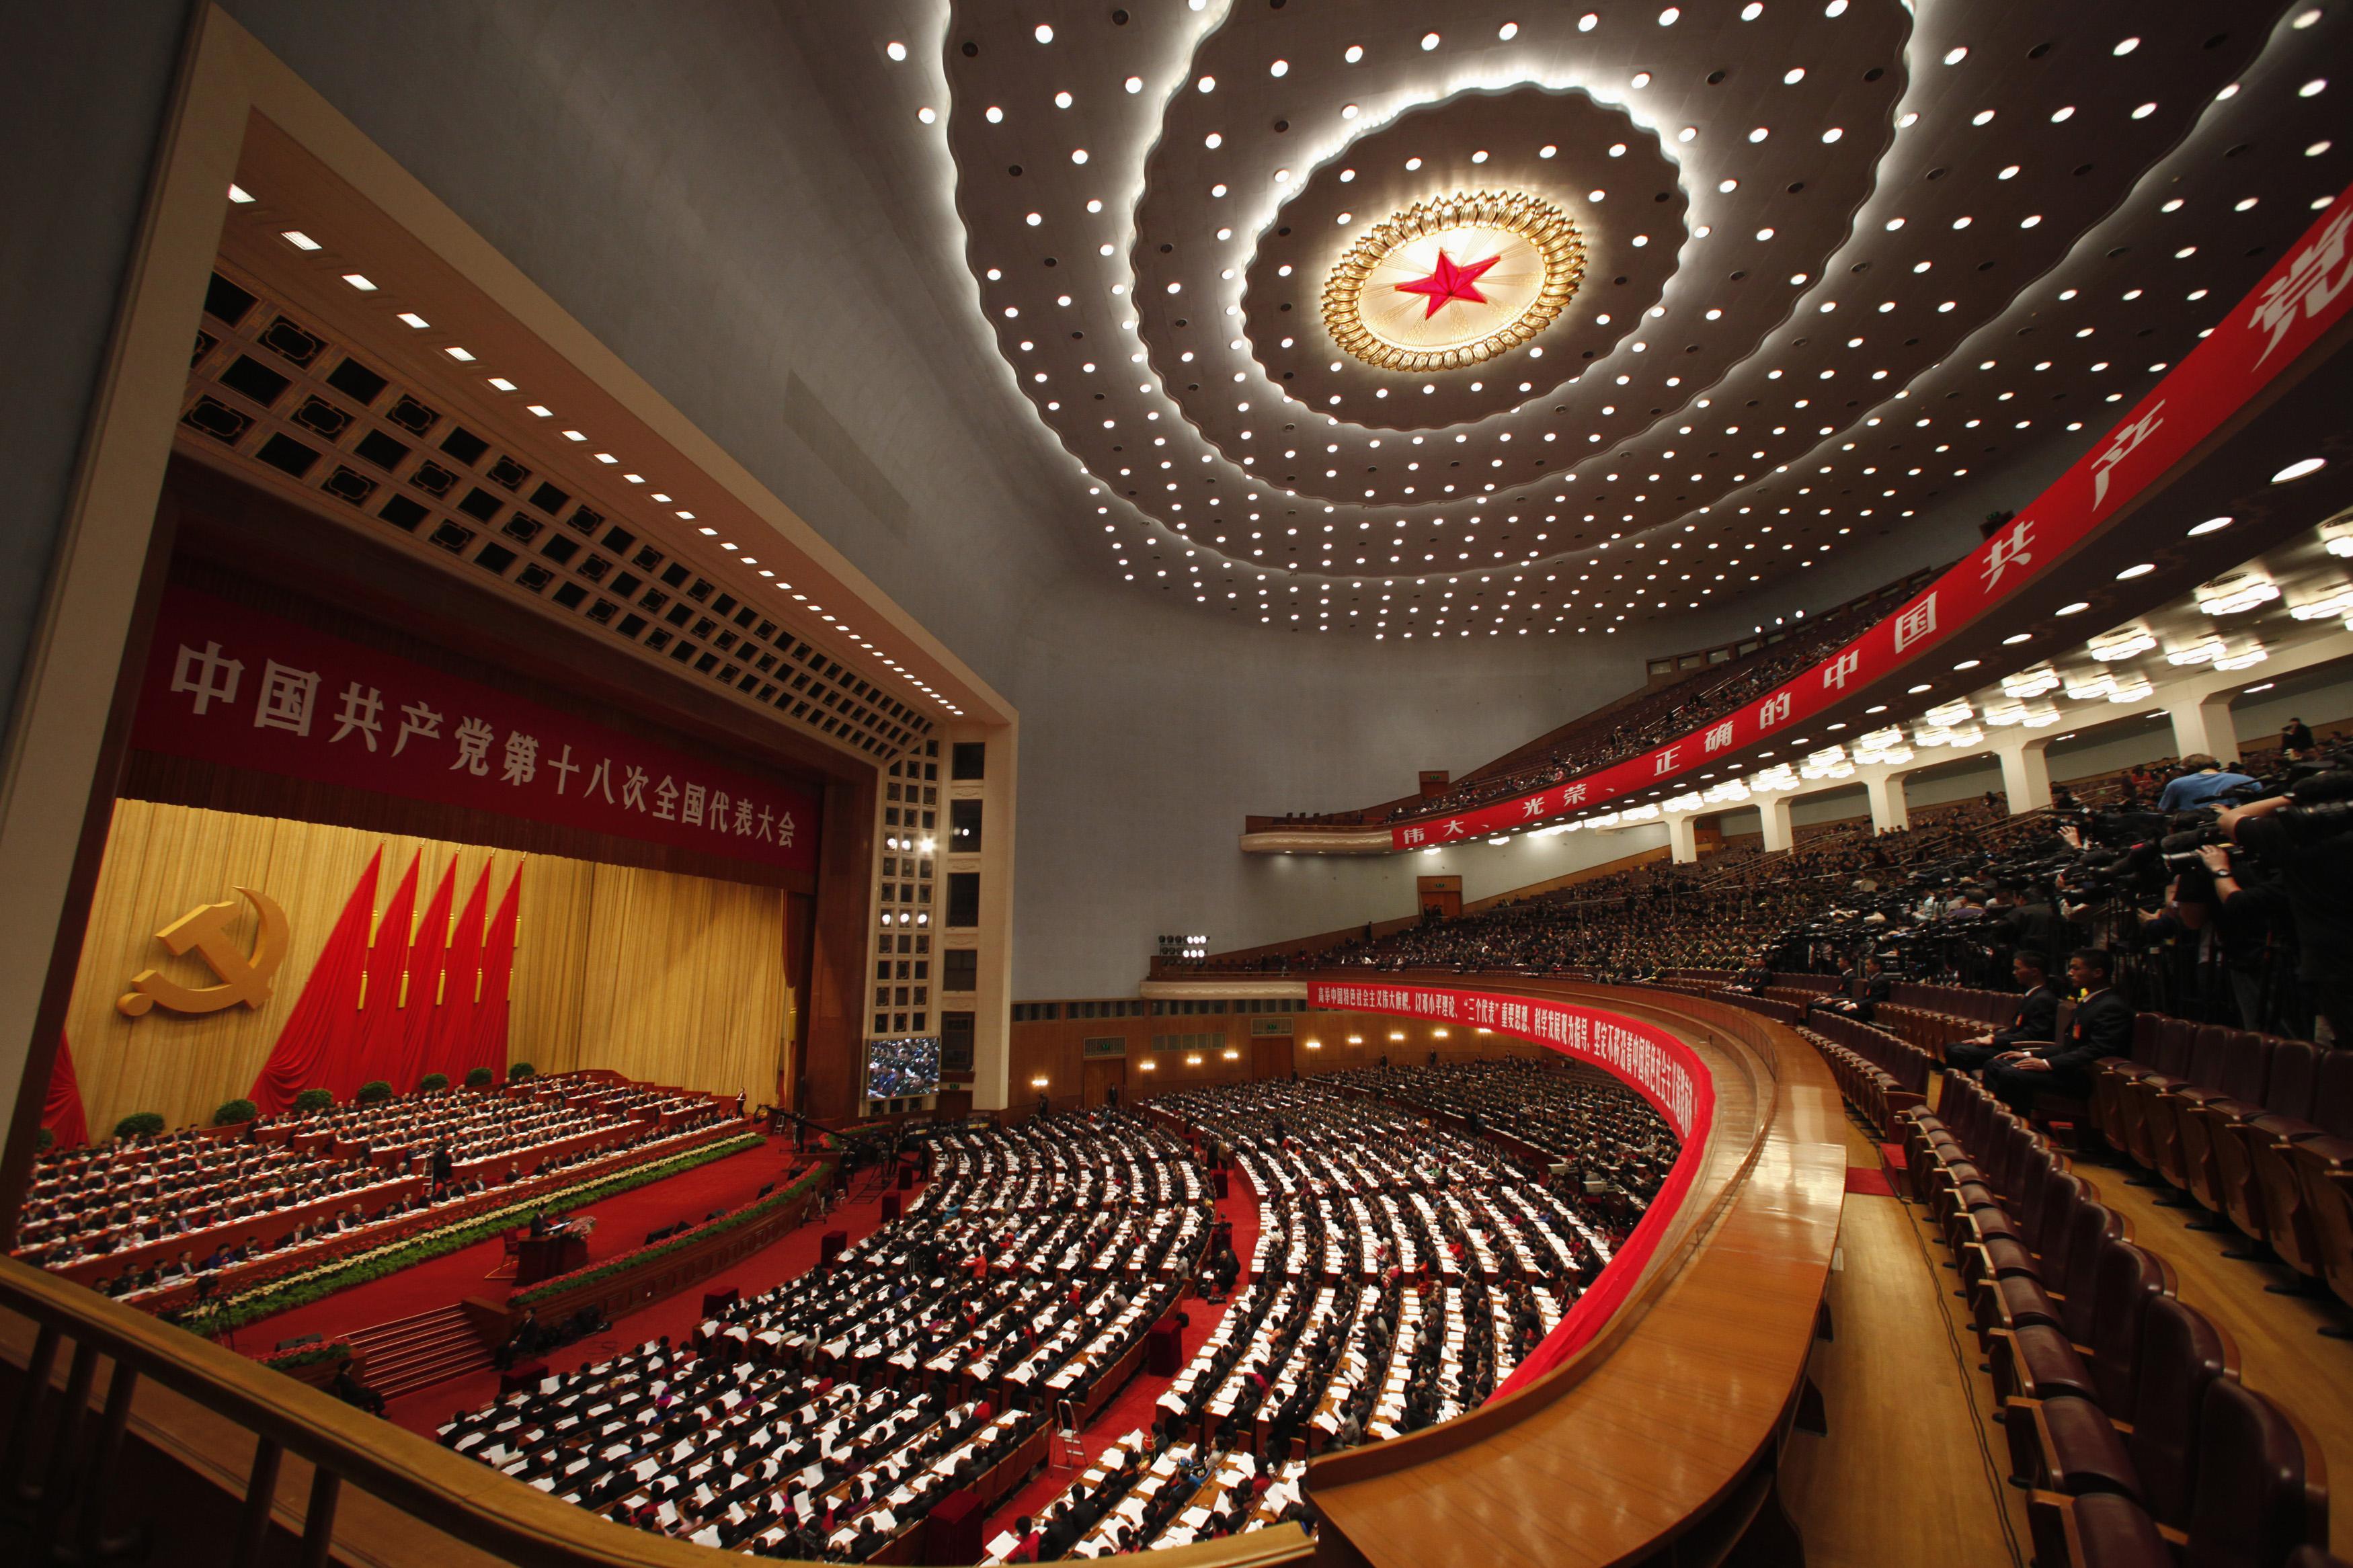 brookings.edu - Cheng Li - China's new Politburo Standing Committee